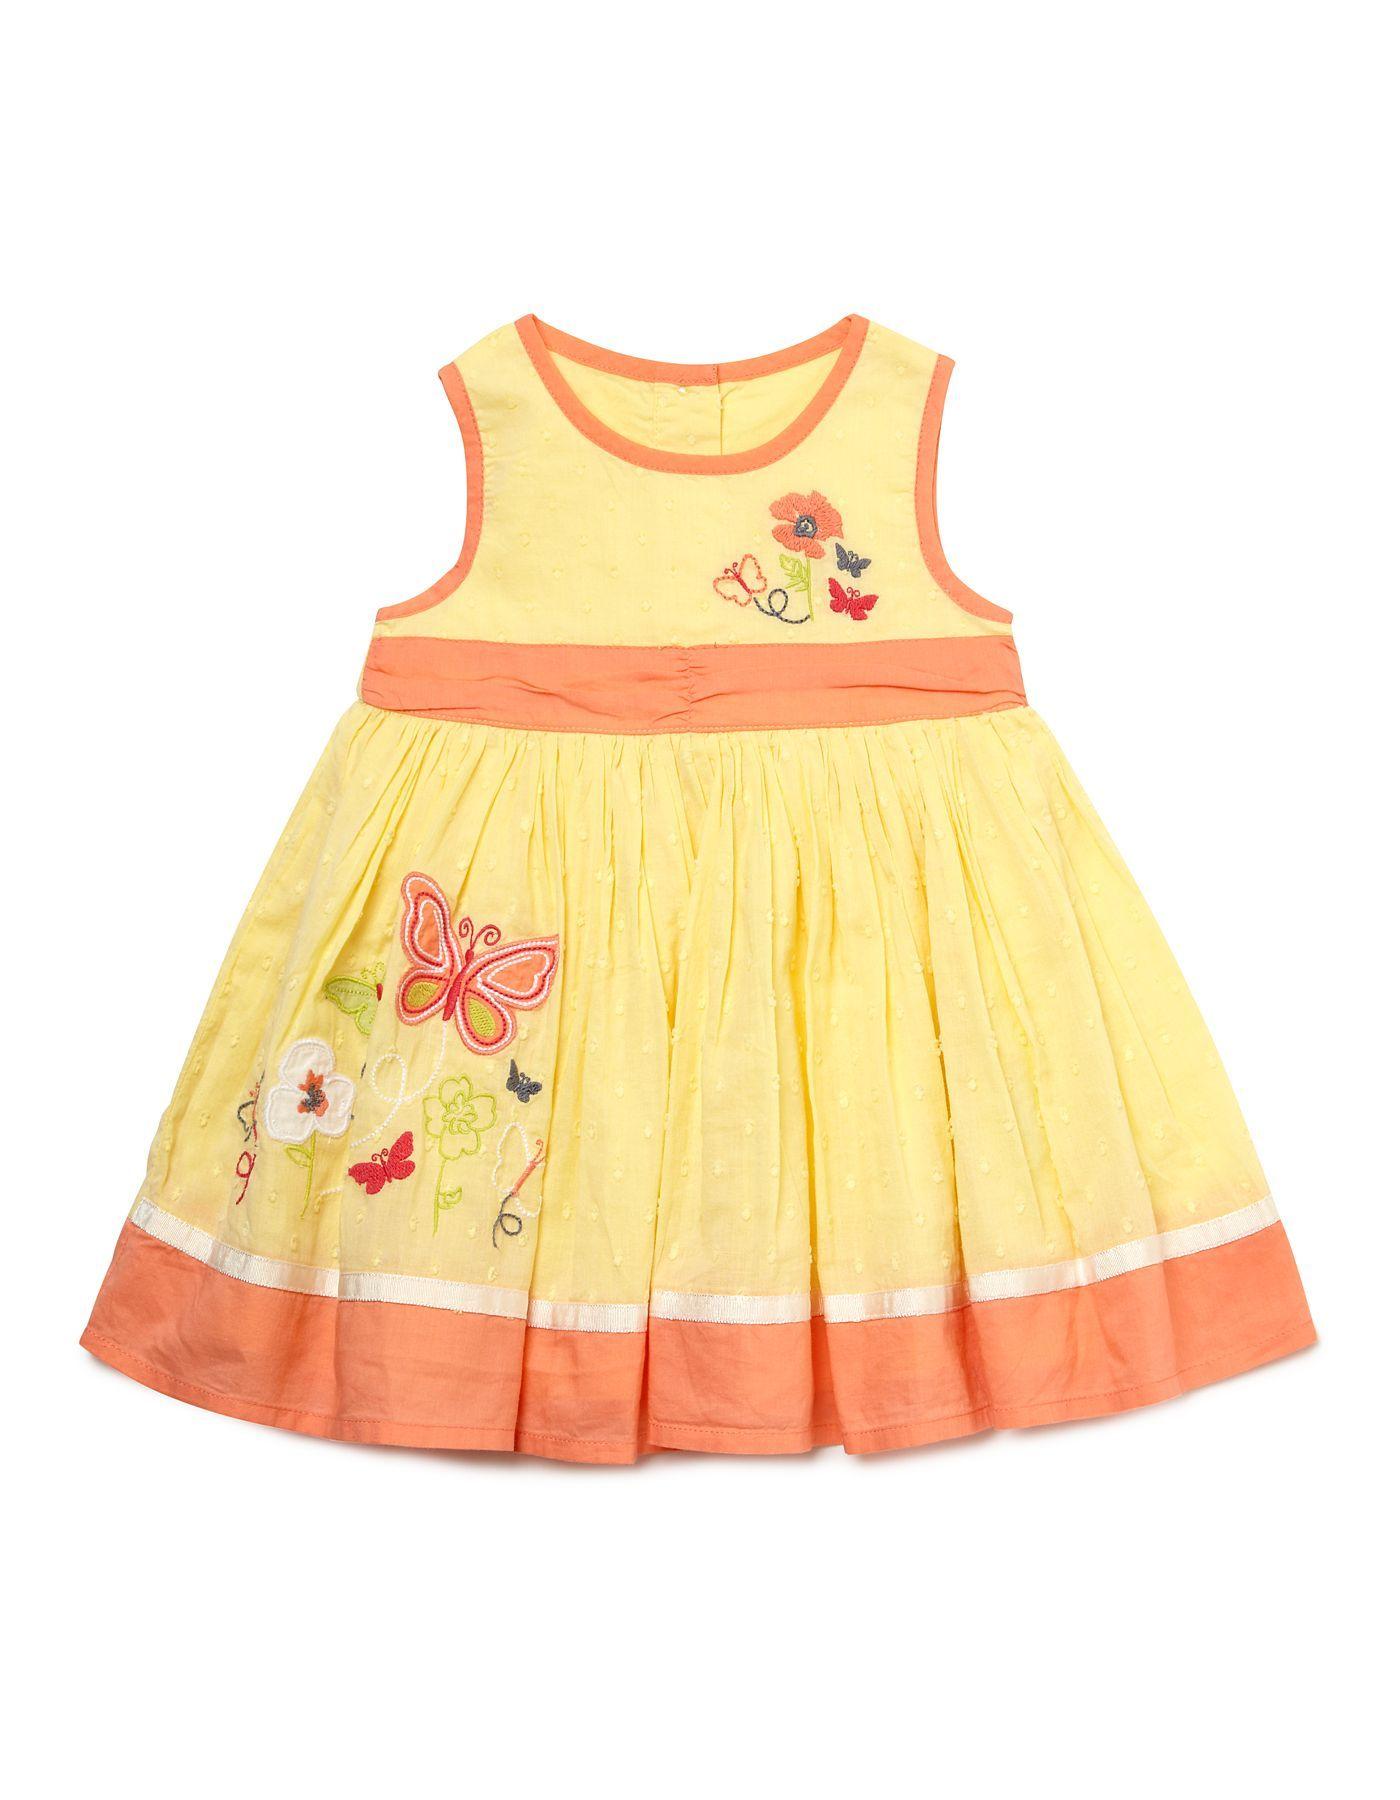 c41381cd8 Baby Border Sun Dress